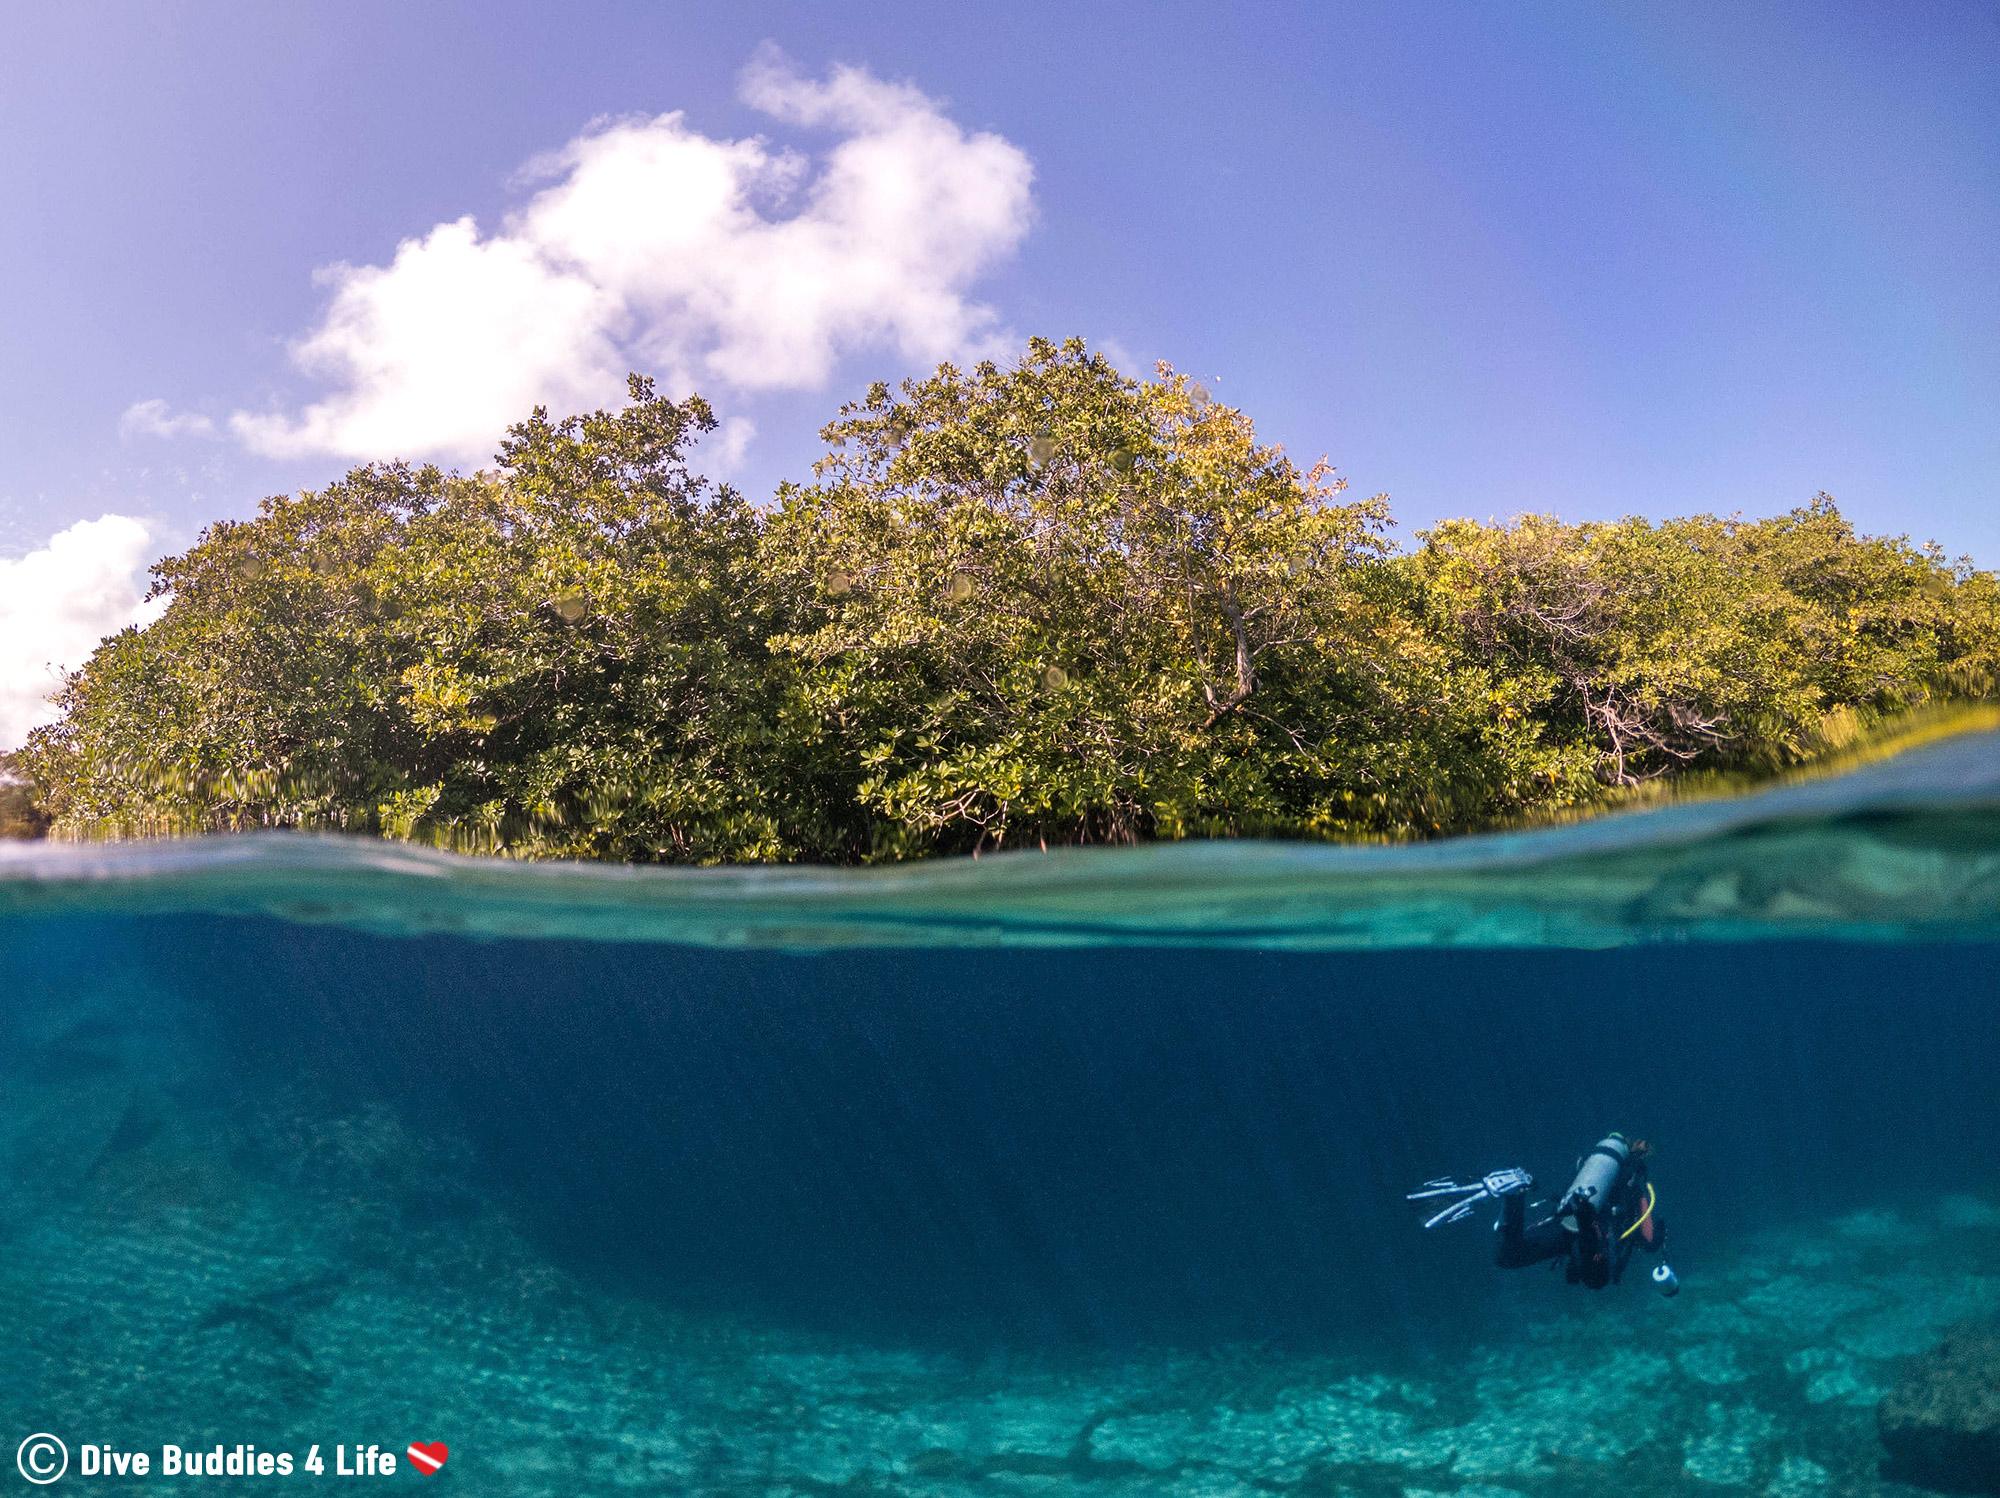 Ali Diving Into The Mangroves Of Casa Cenote In Tulum, Cavern Scuba Diving In Mexico